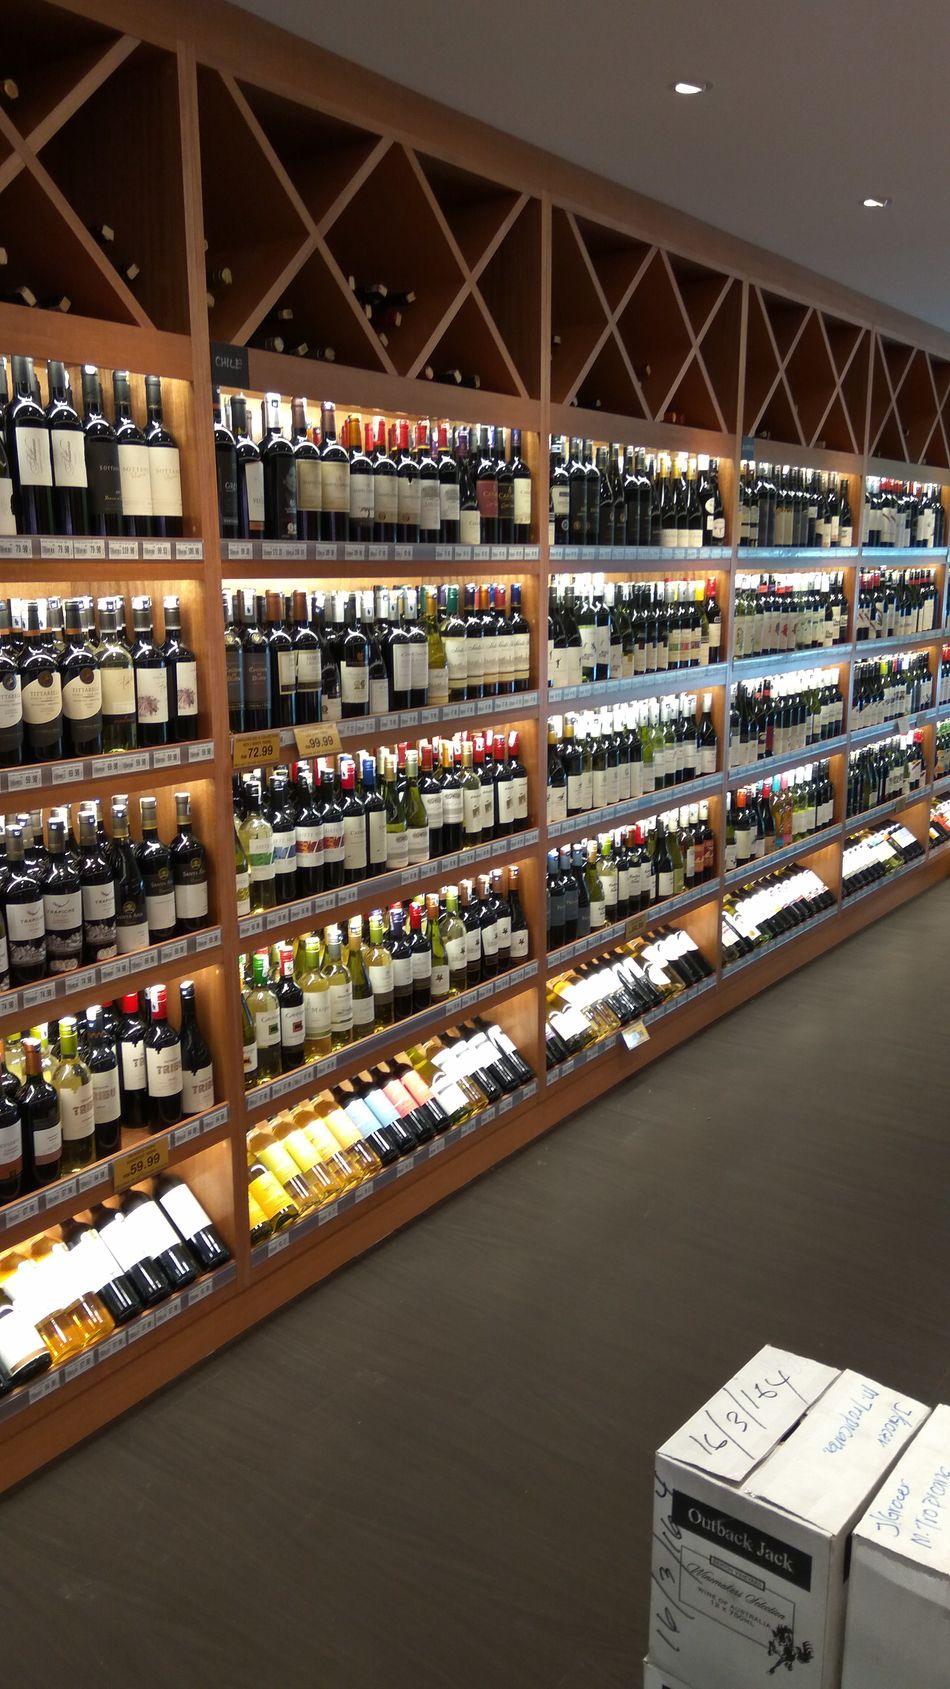 Bottle Choice Abundance Wine Bottle Shelf Indoors  Store In A Row Liquor Store Wine Wine Rack Retail  Eyeemphotography EyeEmBestPics Whats Good? Spoilt For Choice